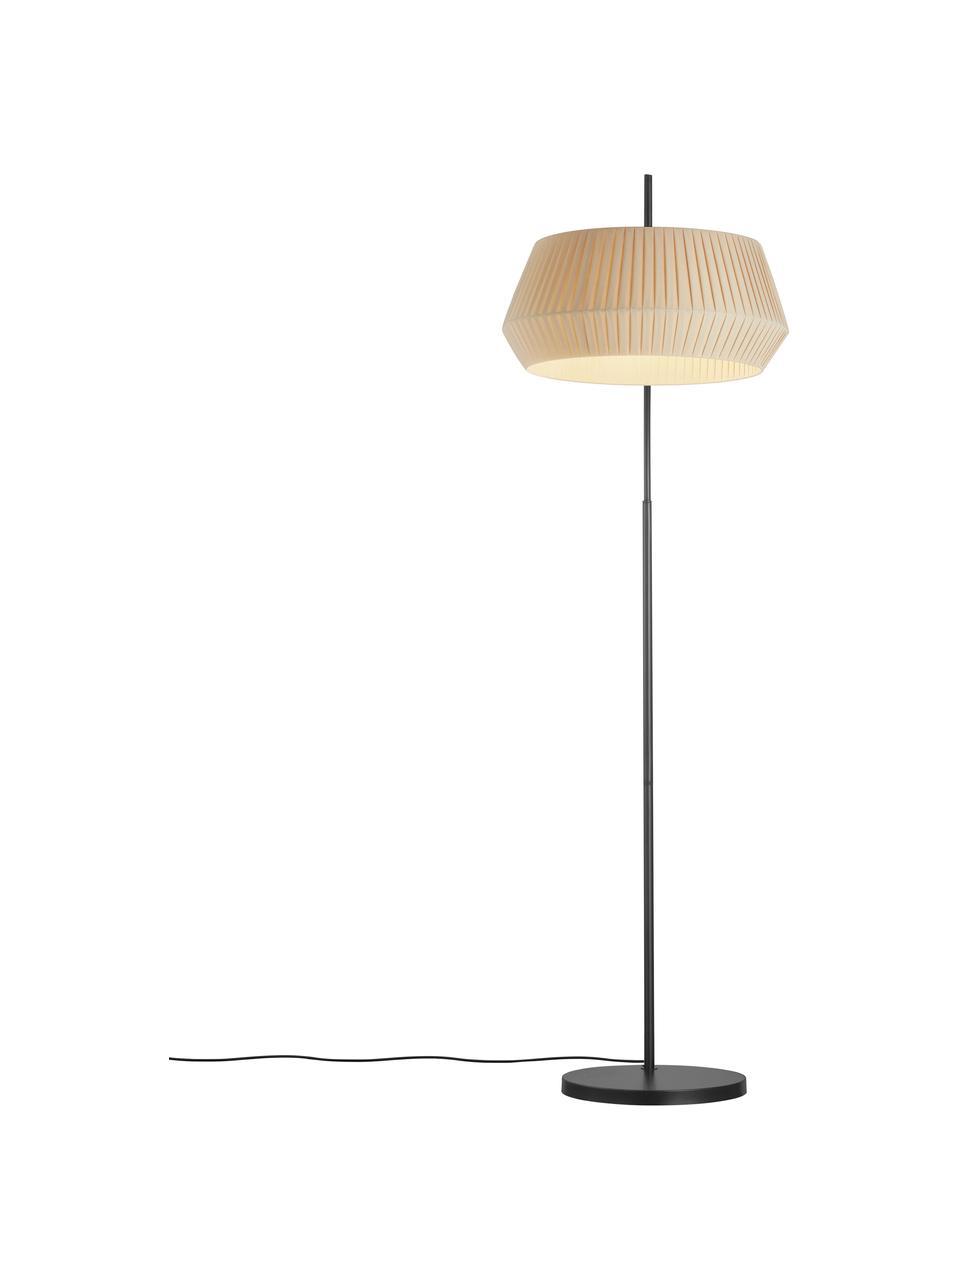 Große Bogenlampe Dicte aus Faltenstoff, Lampenschirm: Stoff, Lampenfuß: Metall, beschichtet, Beige, Schwarz, 104 x 180 cm